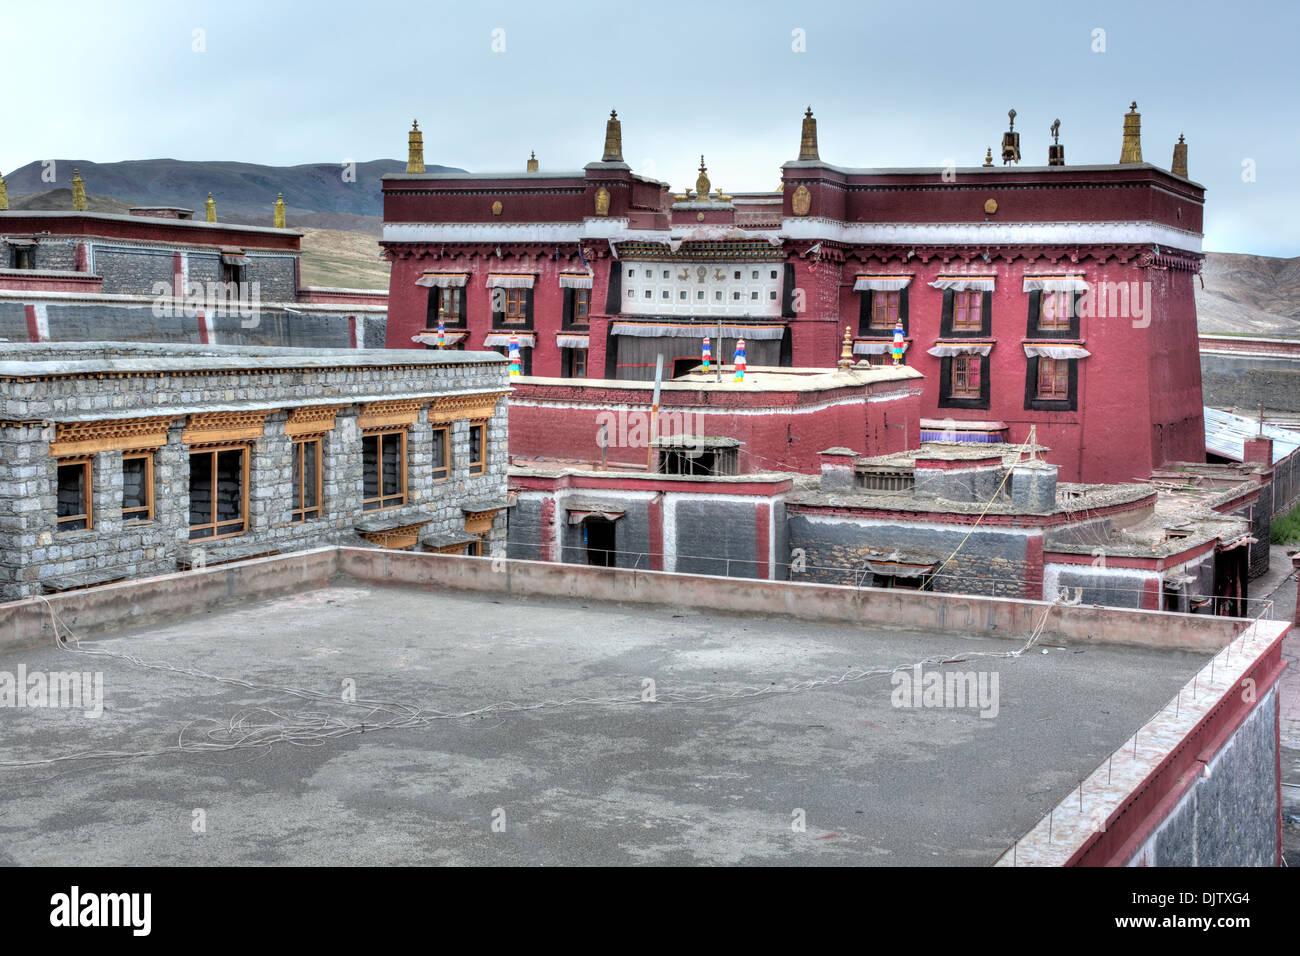 Sakya Monastery, Shigatse Prefecture, Tibet, China - Stock Image